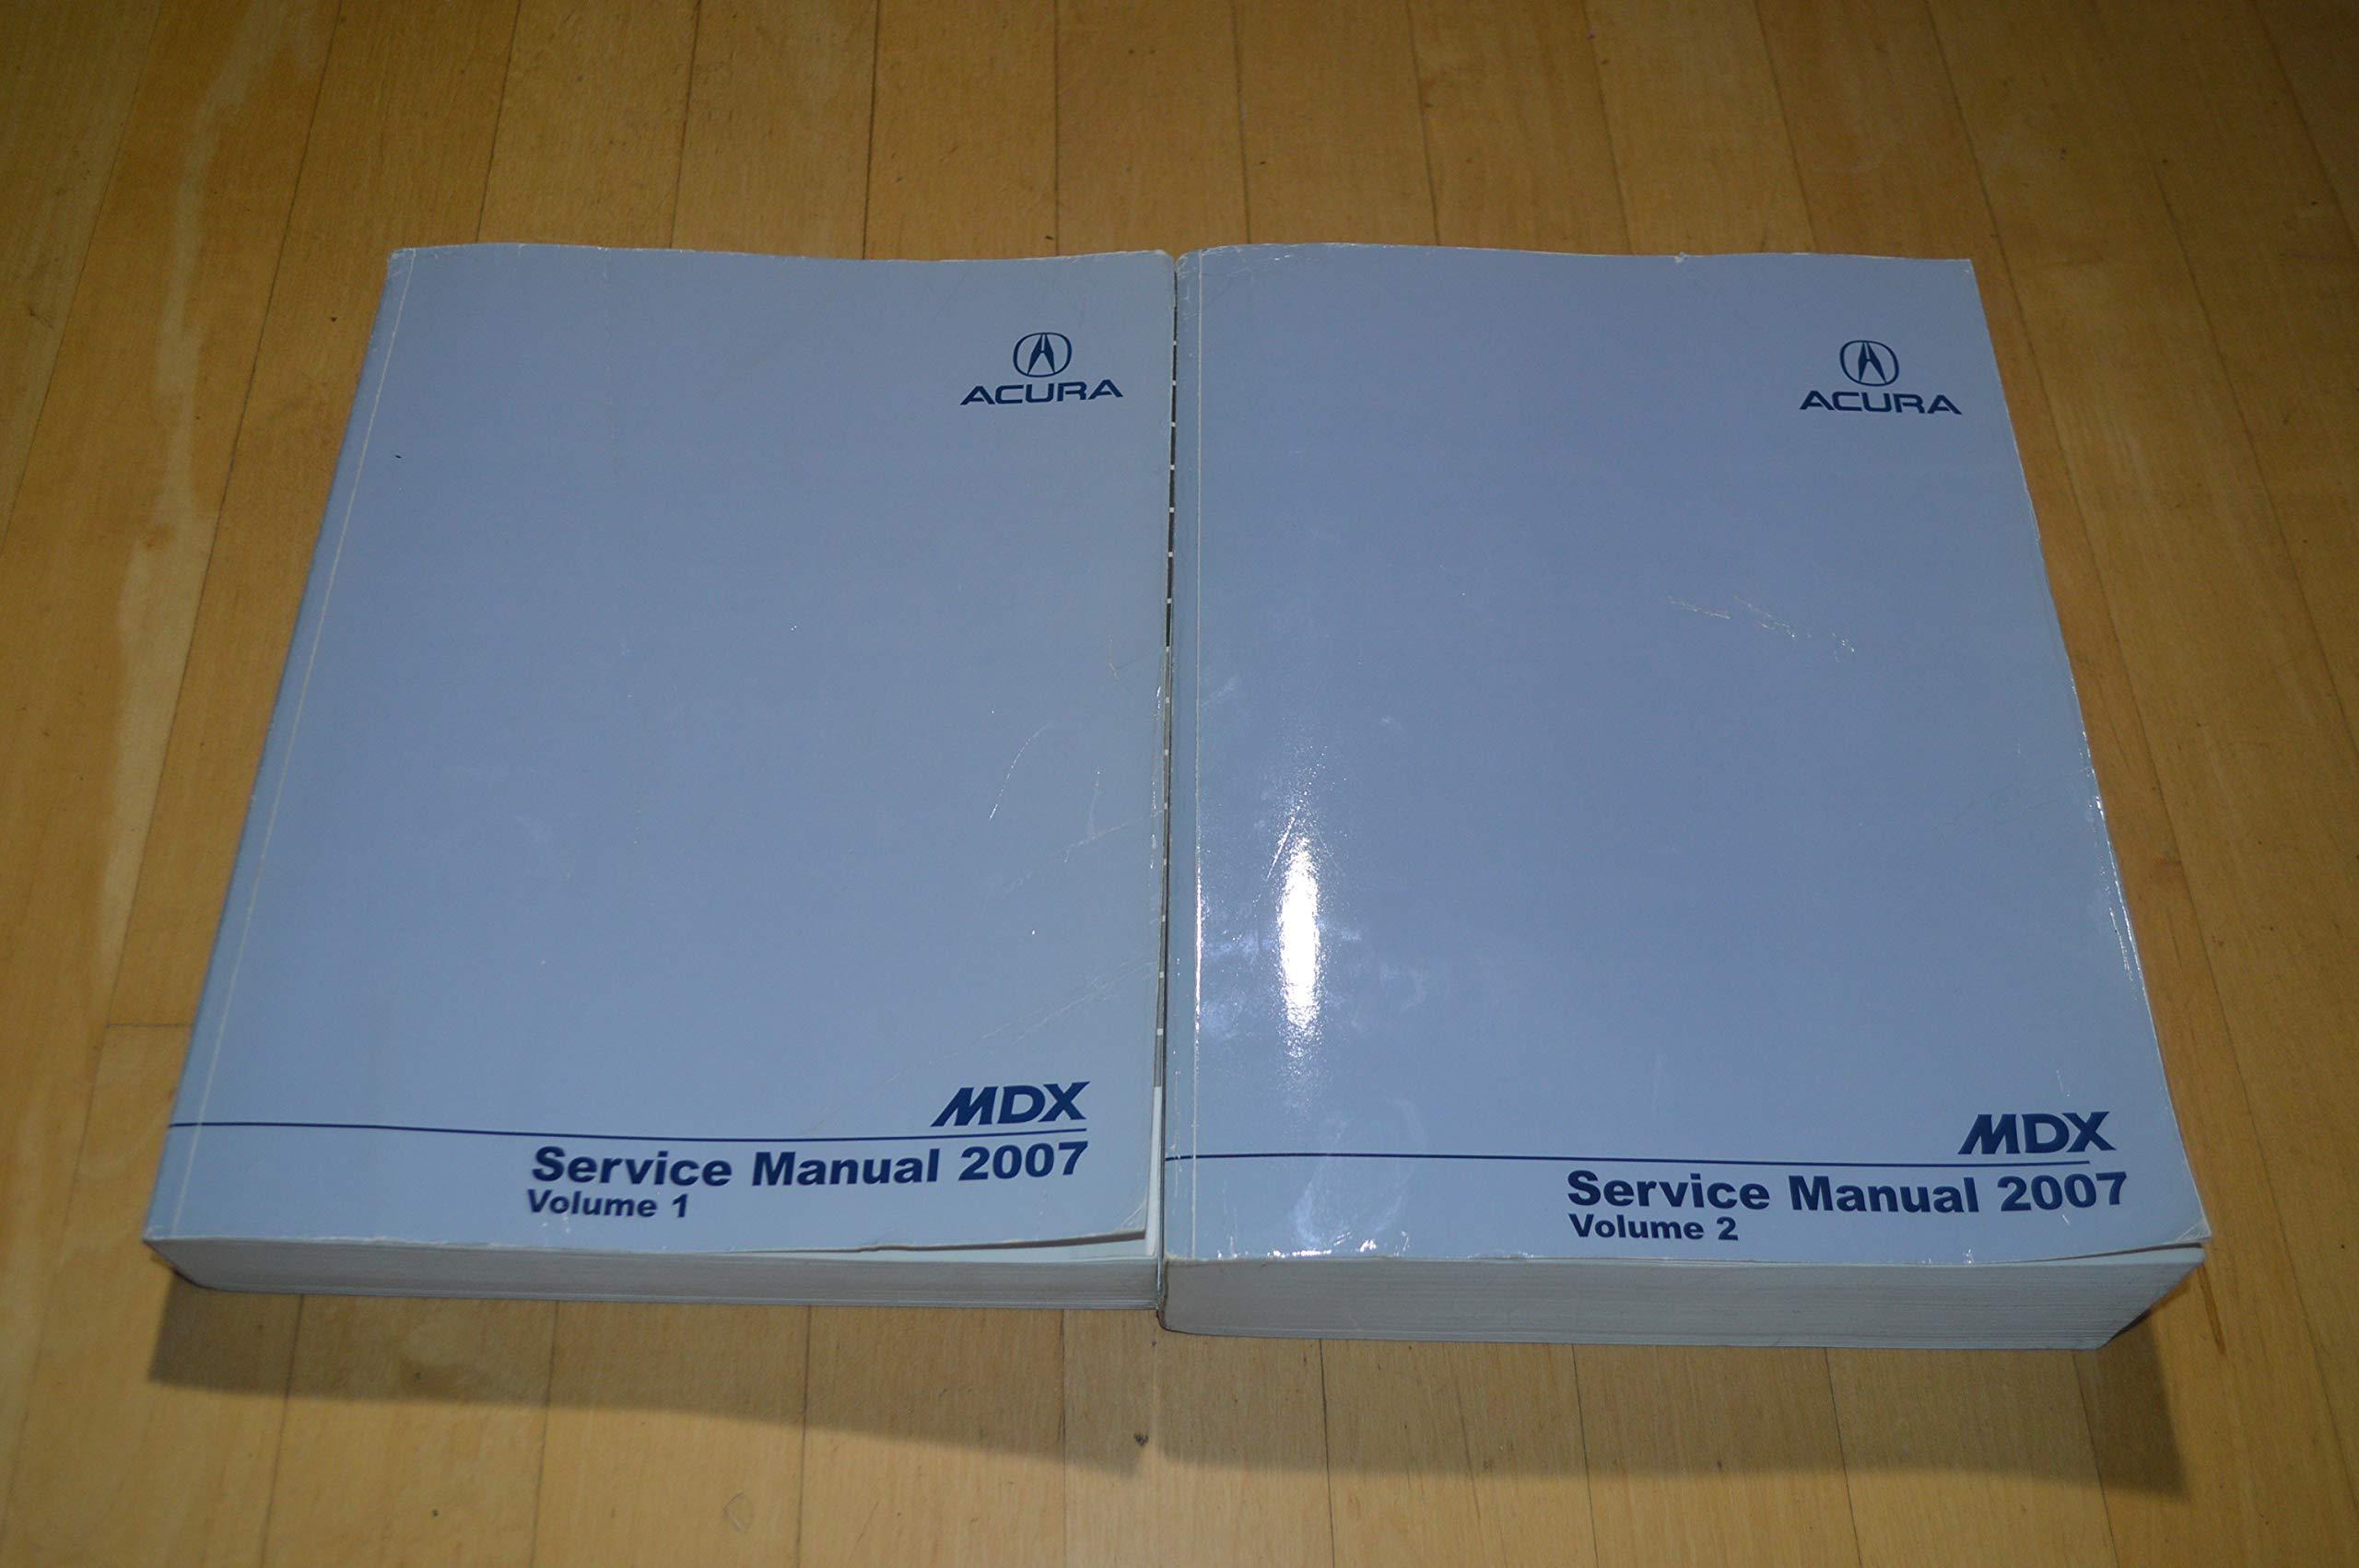 Acura mdx 2007-2009 service repair manual.